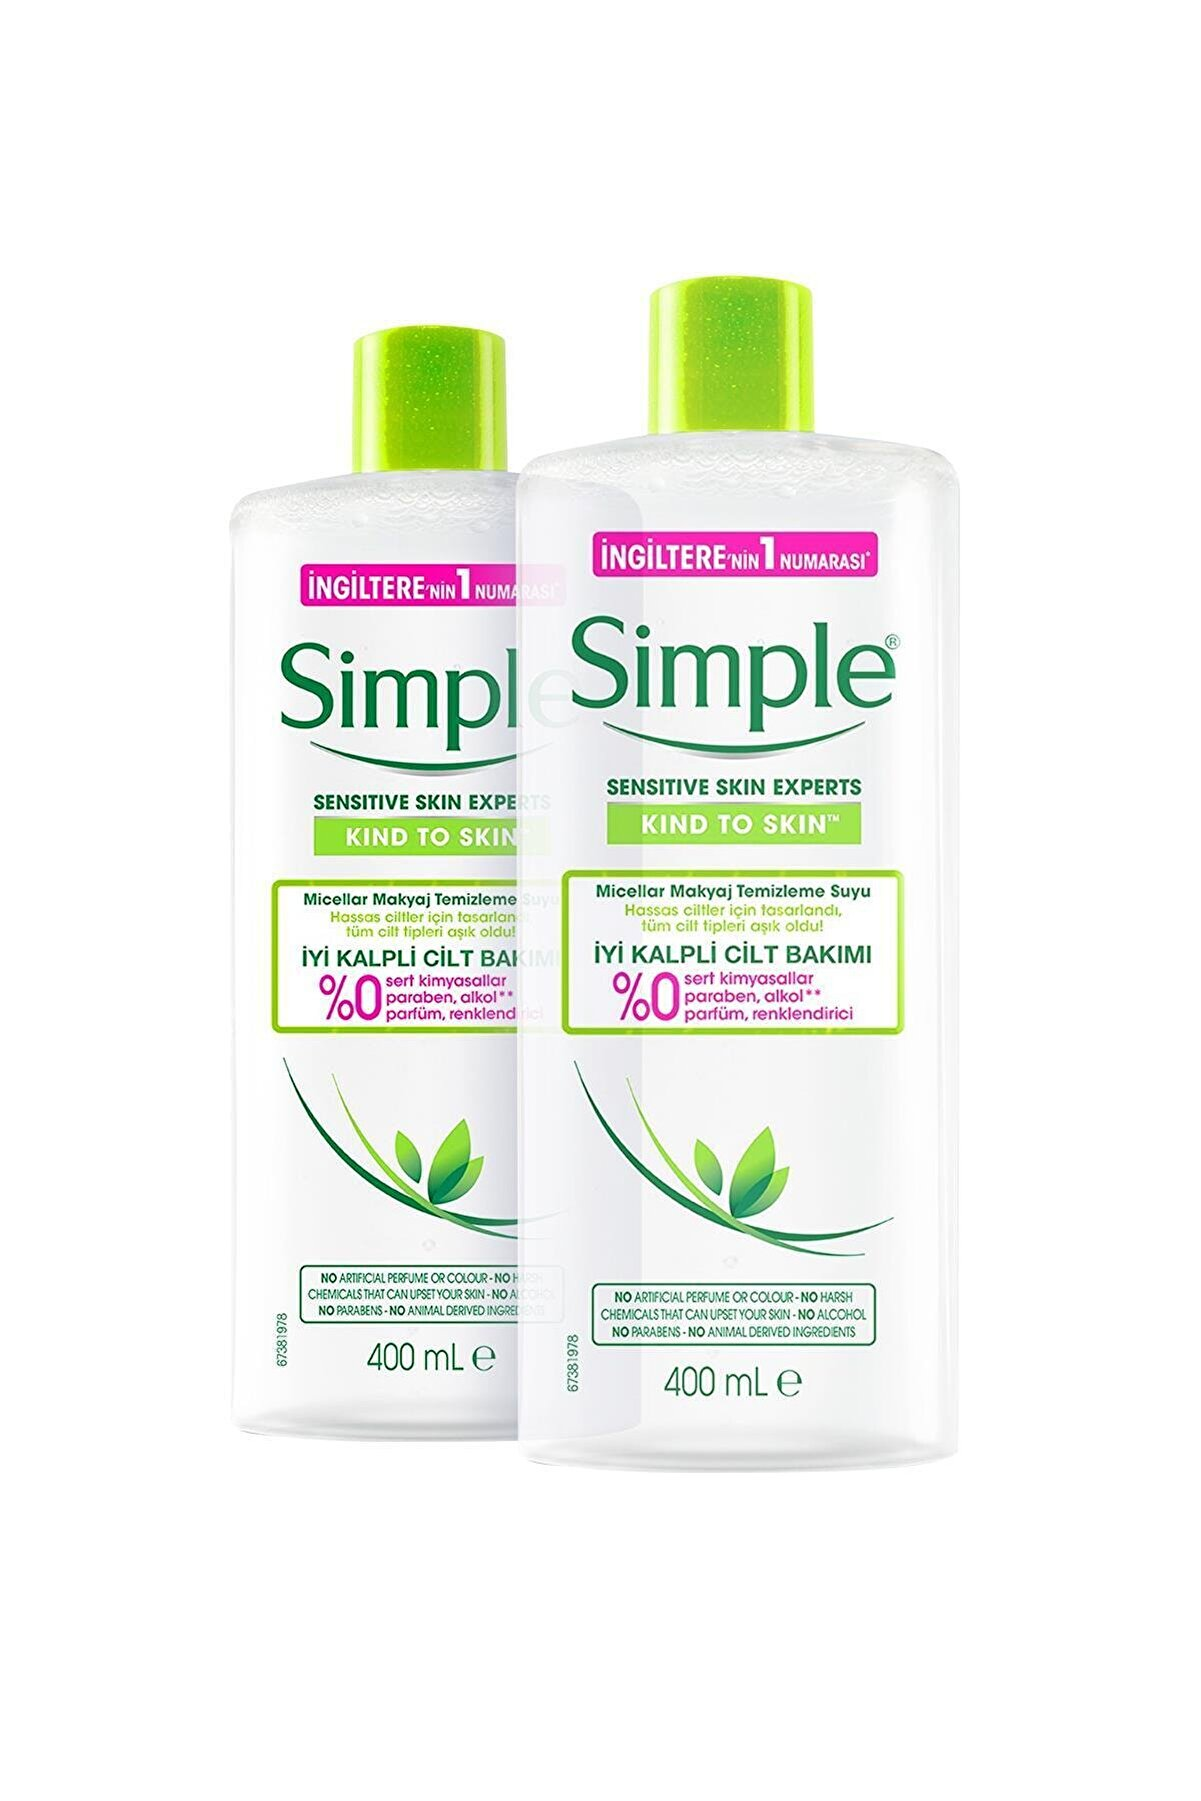 Simple Kind To Skin Hassas Ciltlere Uygun Micellar Makyaj Temizleme Suyu 400 Ml X2